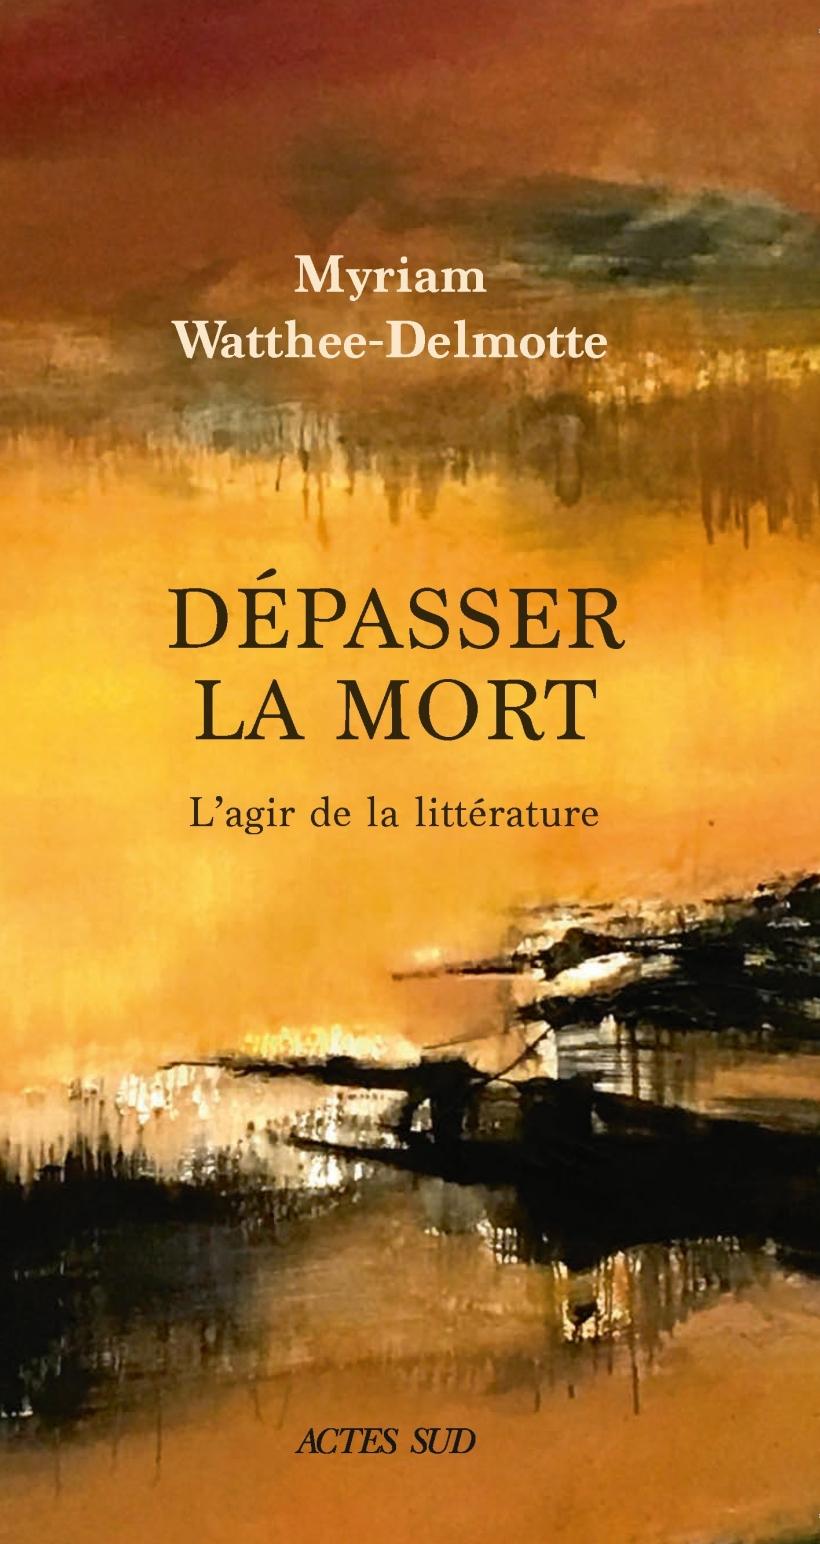 depasser_la_mort_Actes Sud